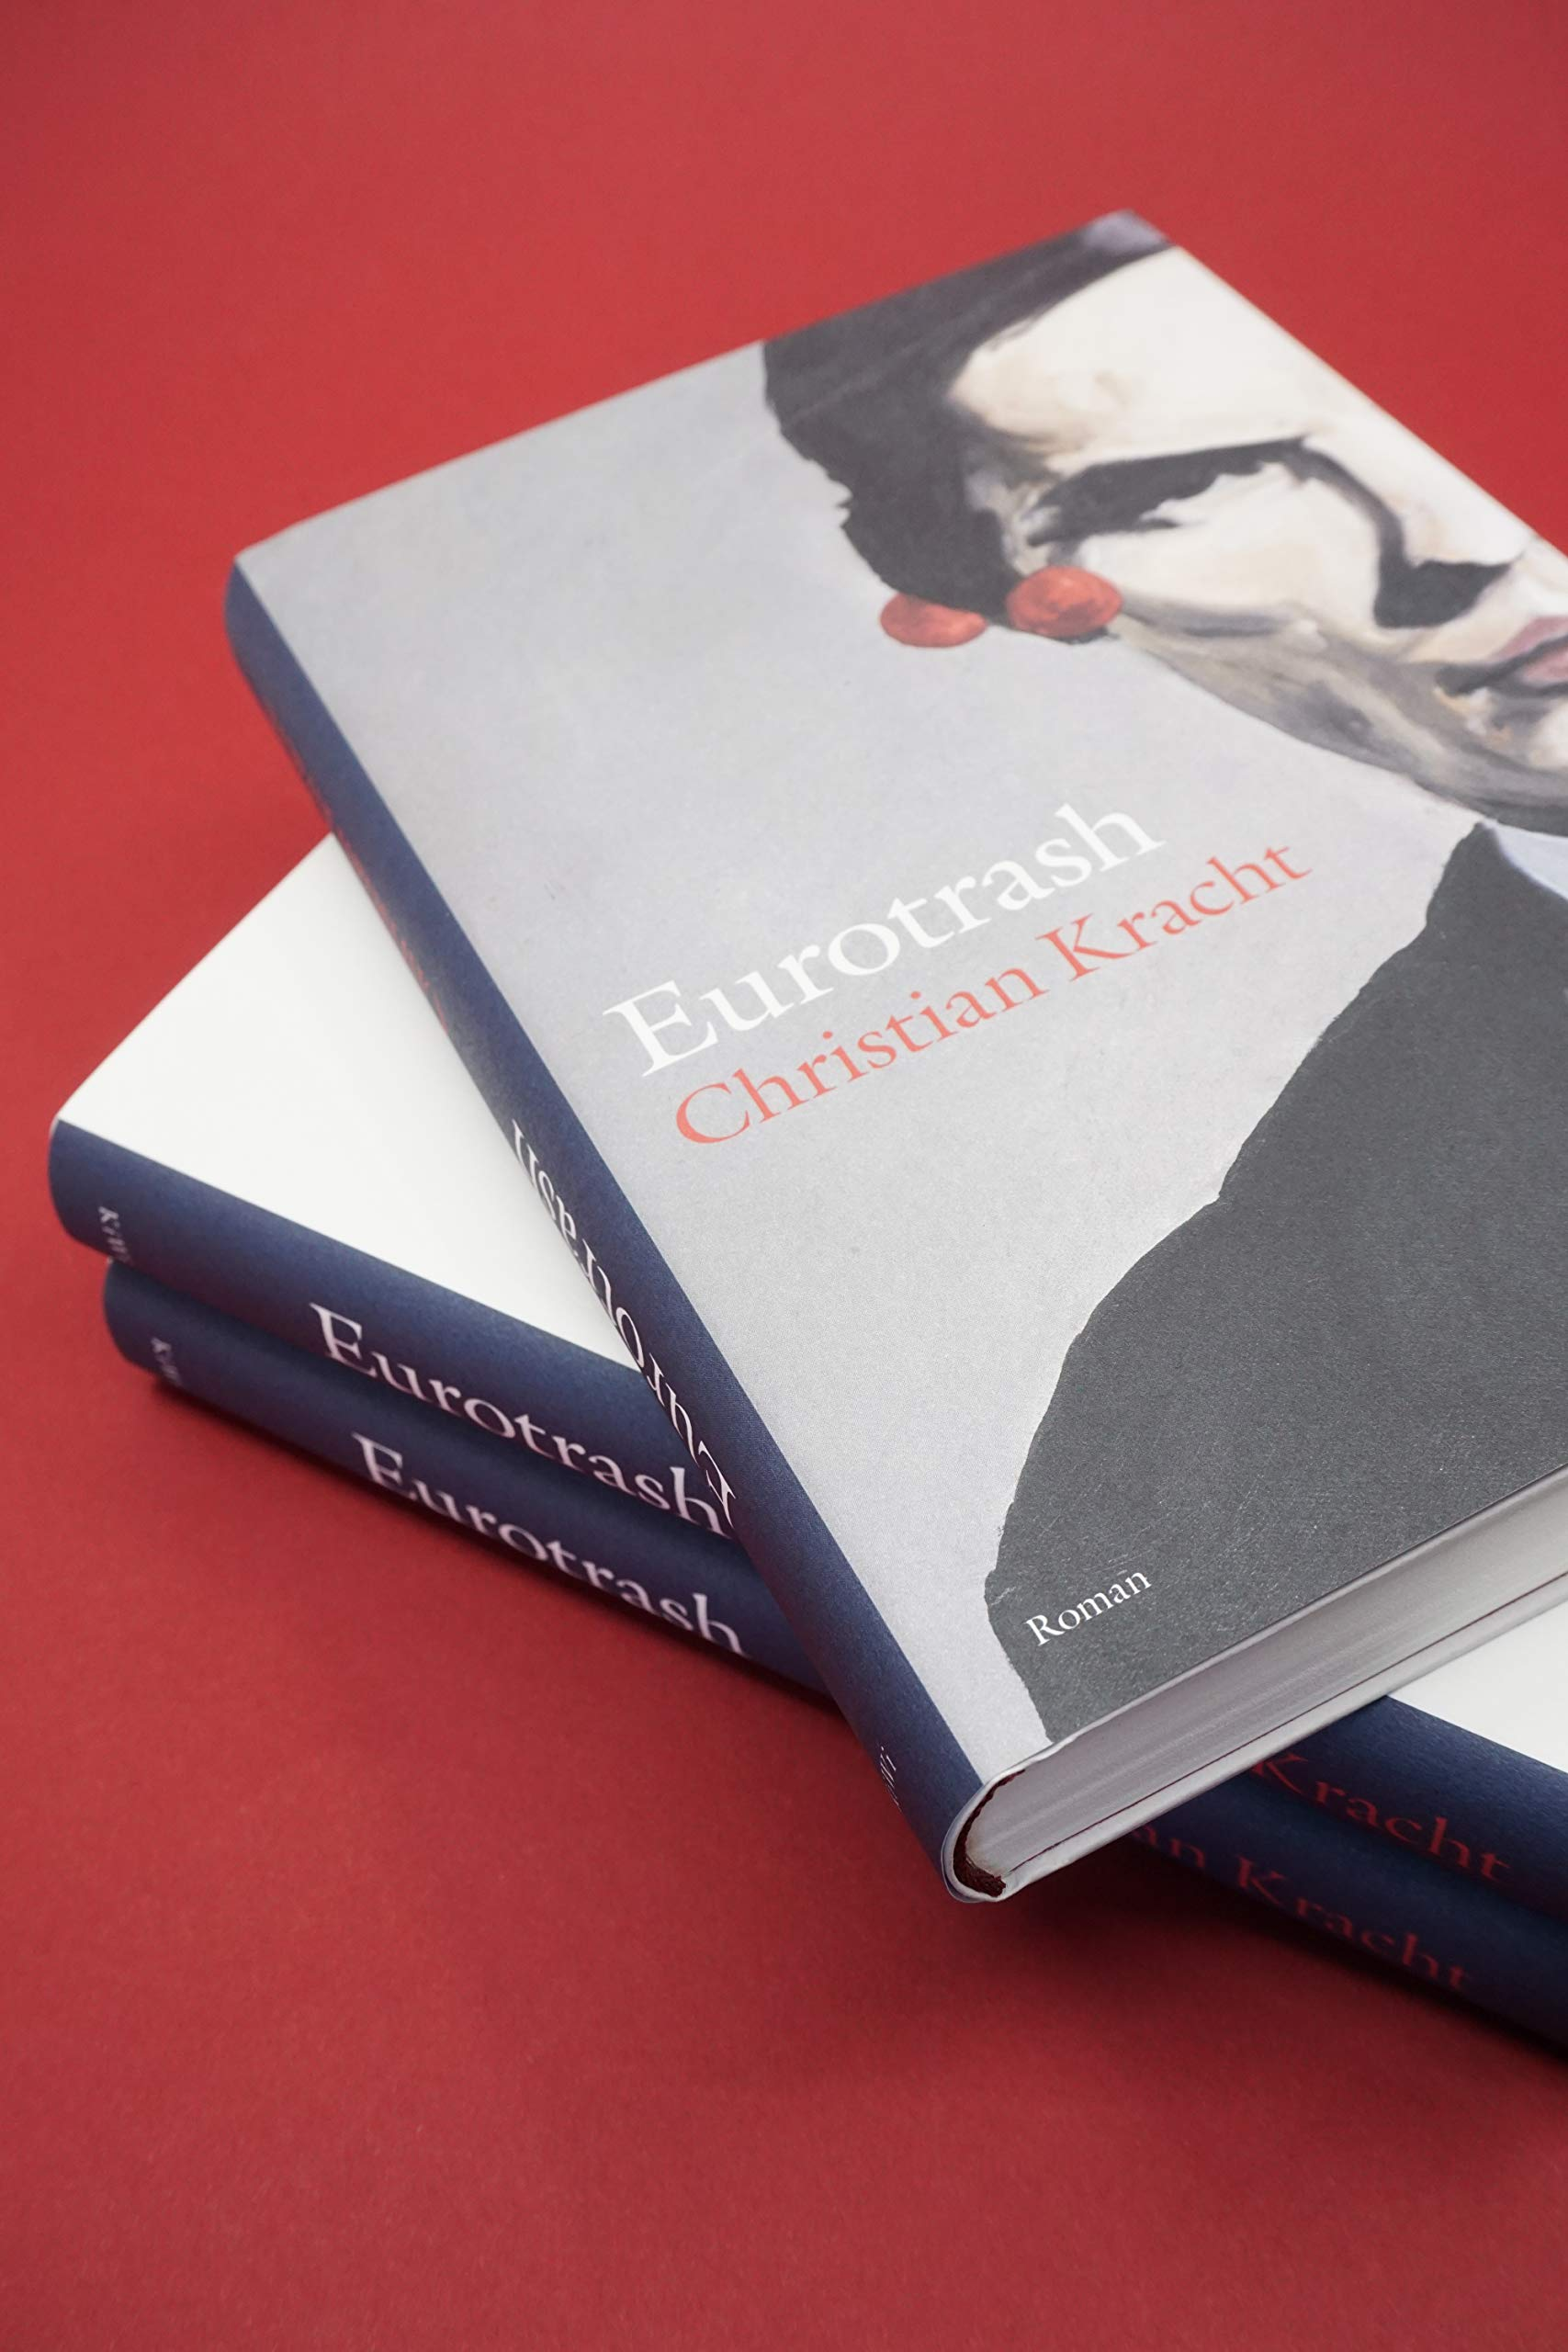 Eurotrash Roman Kracht Christian Bücher